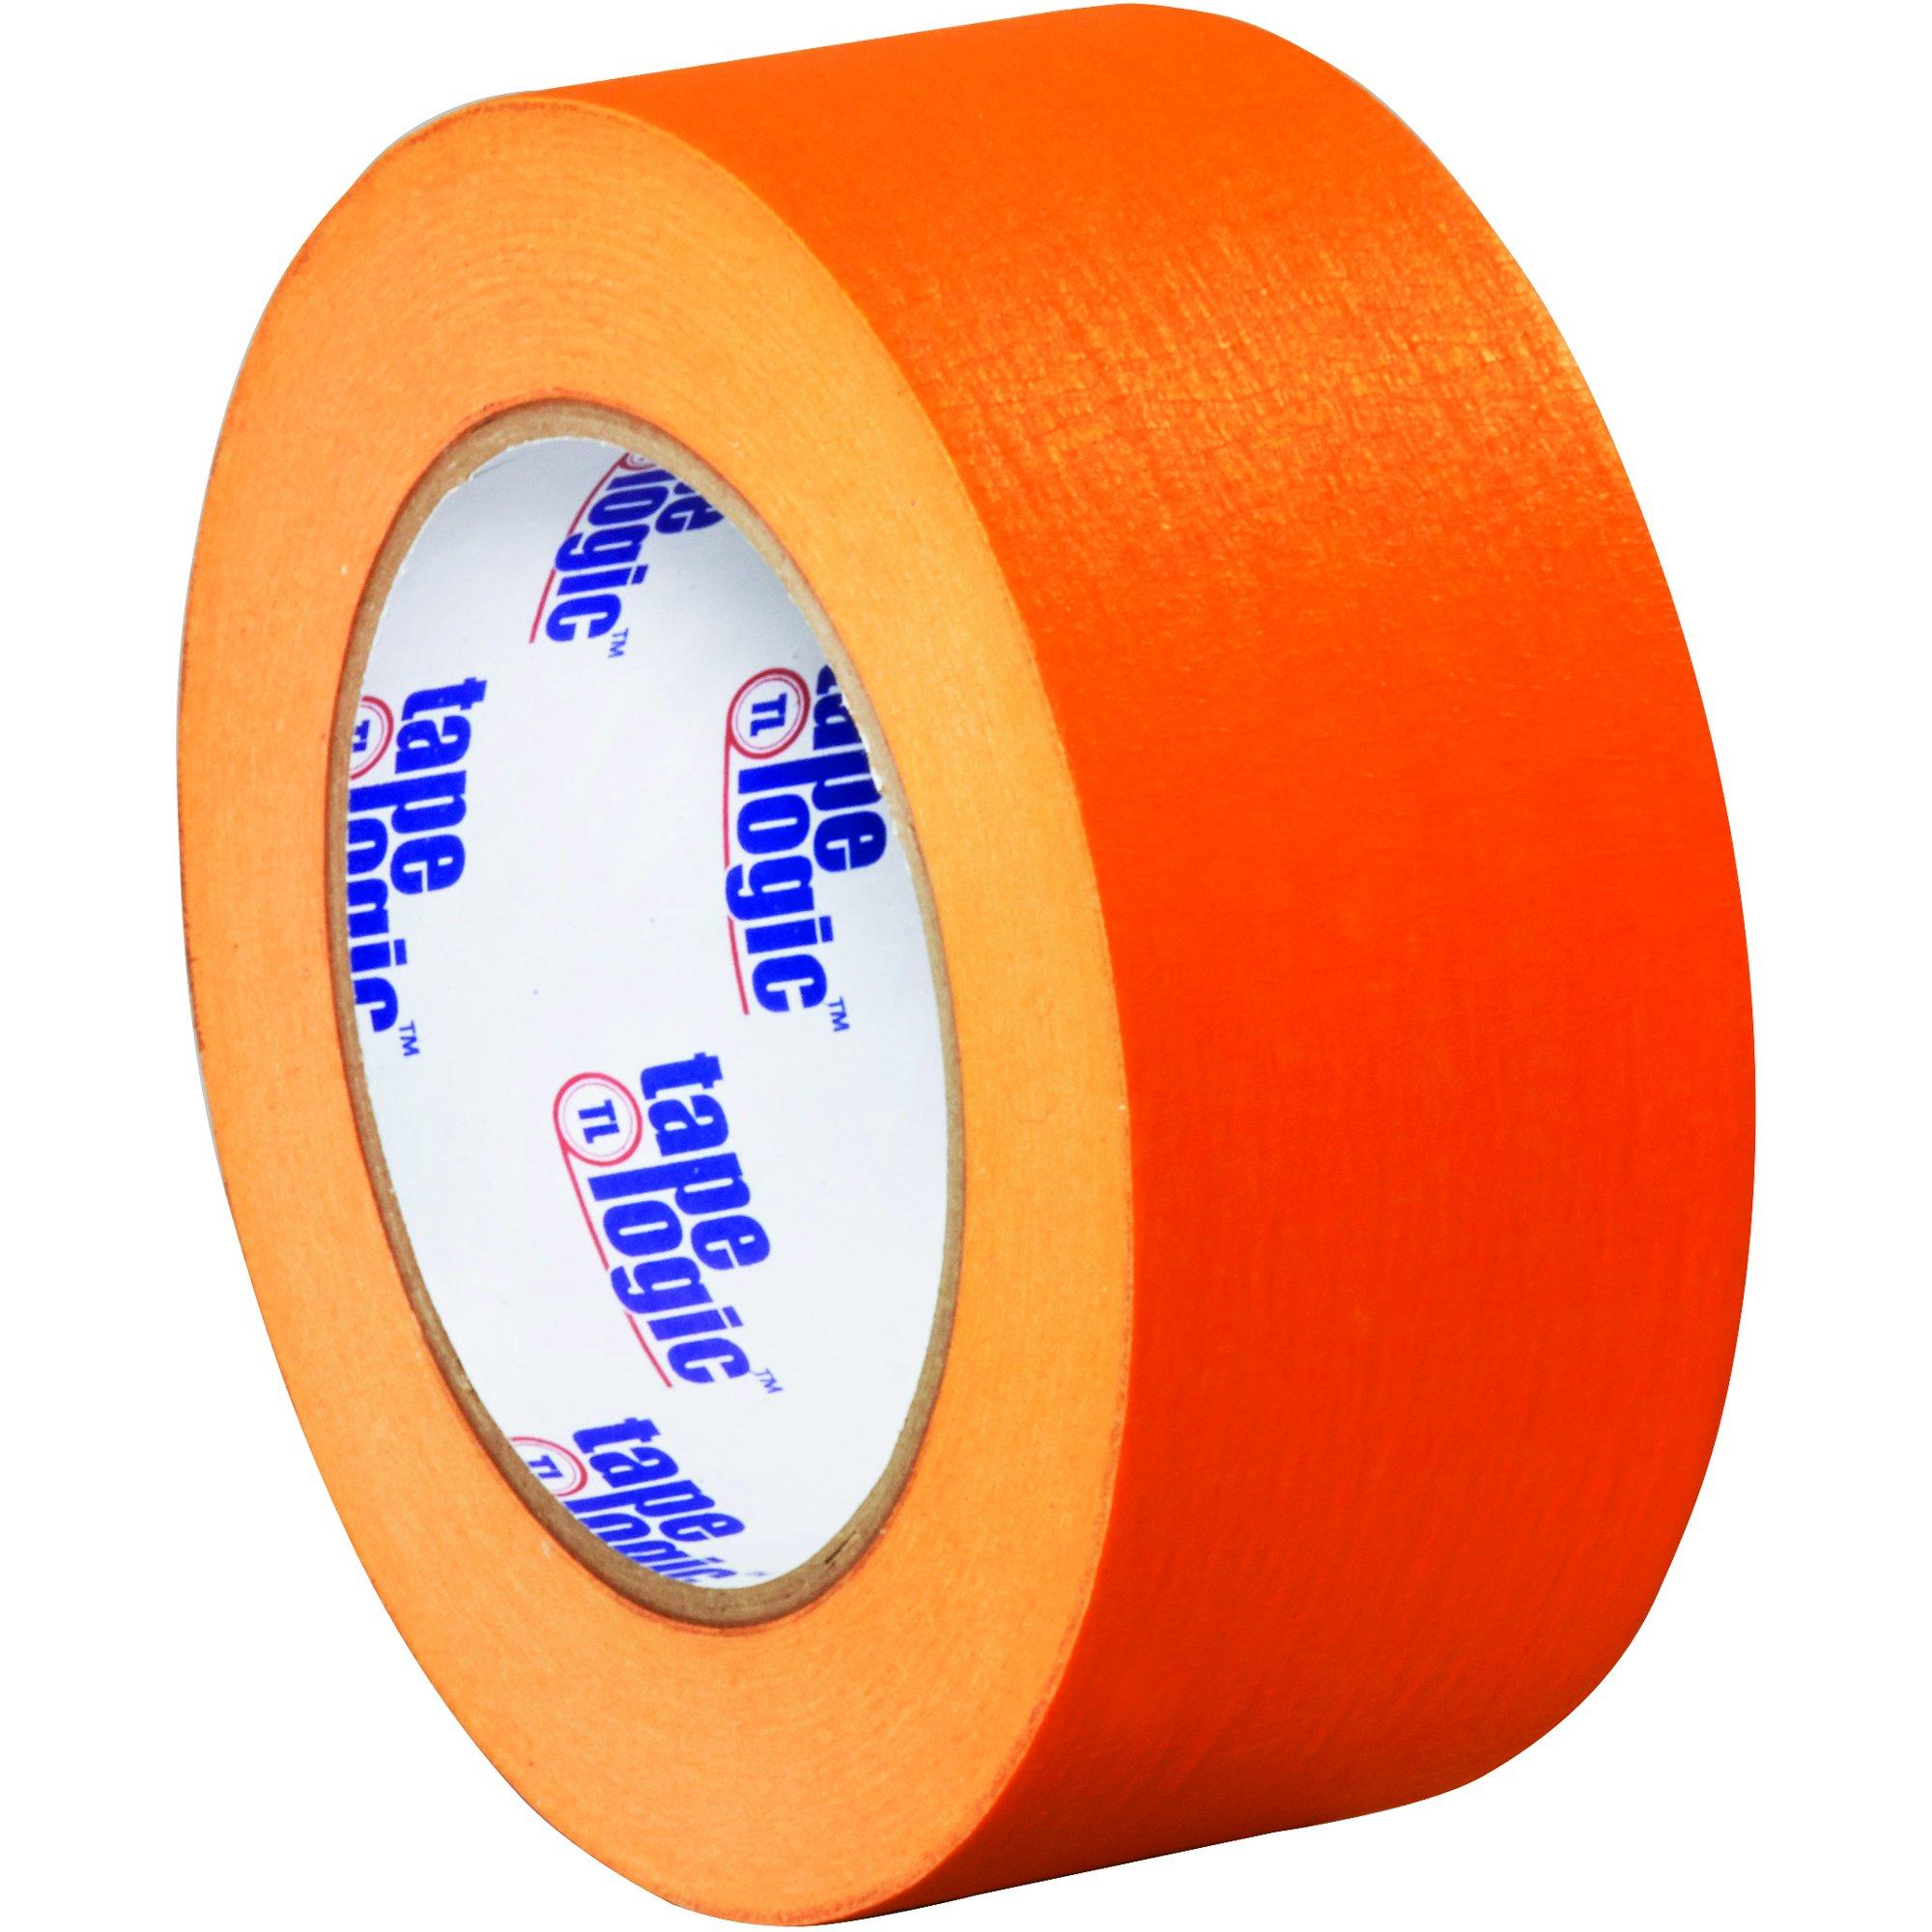 BOX USA BT93700312PKD Tape Logic Masking Tape, 2'' x 60 yd., Orange (Pack of 12) by BOX USA